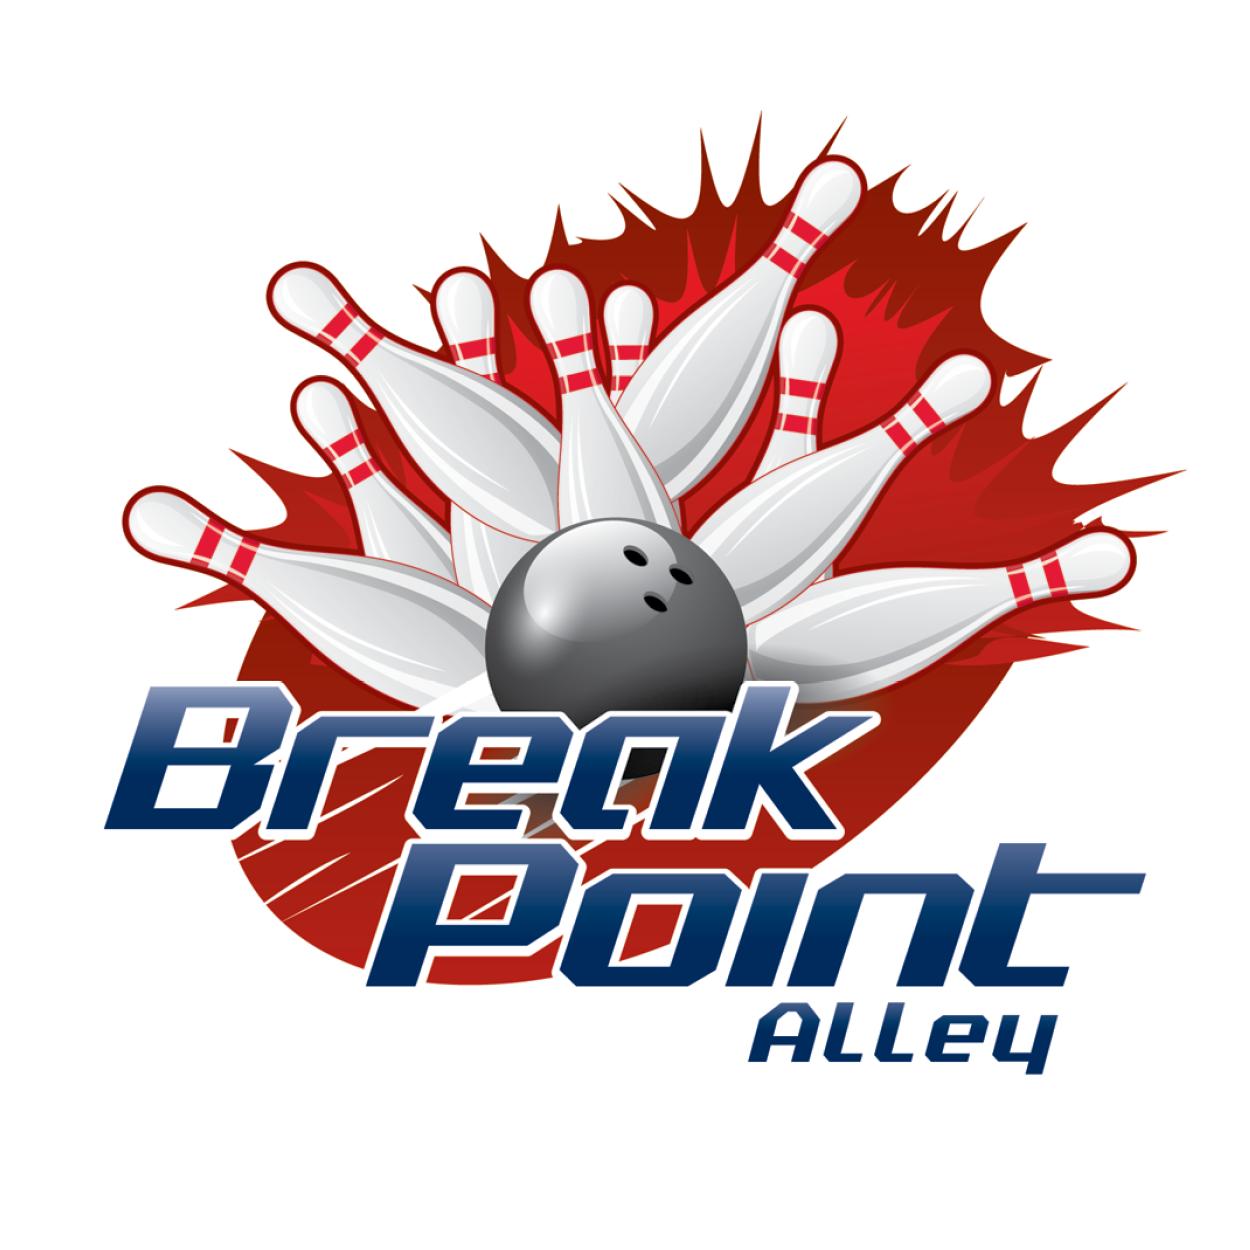 Break Point Alley